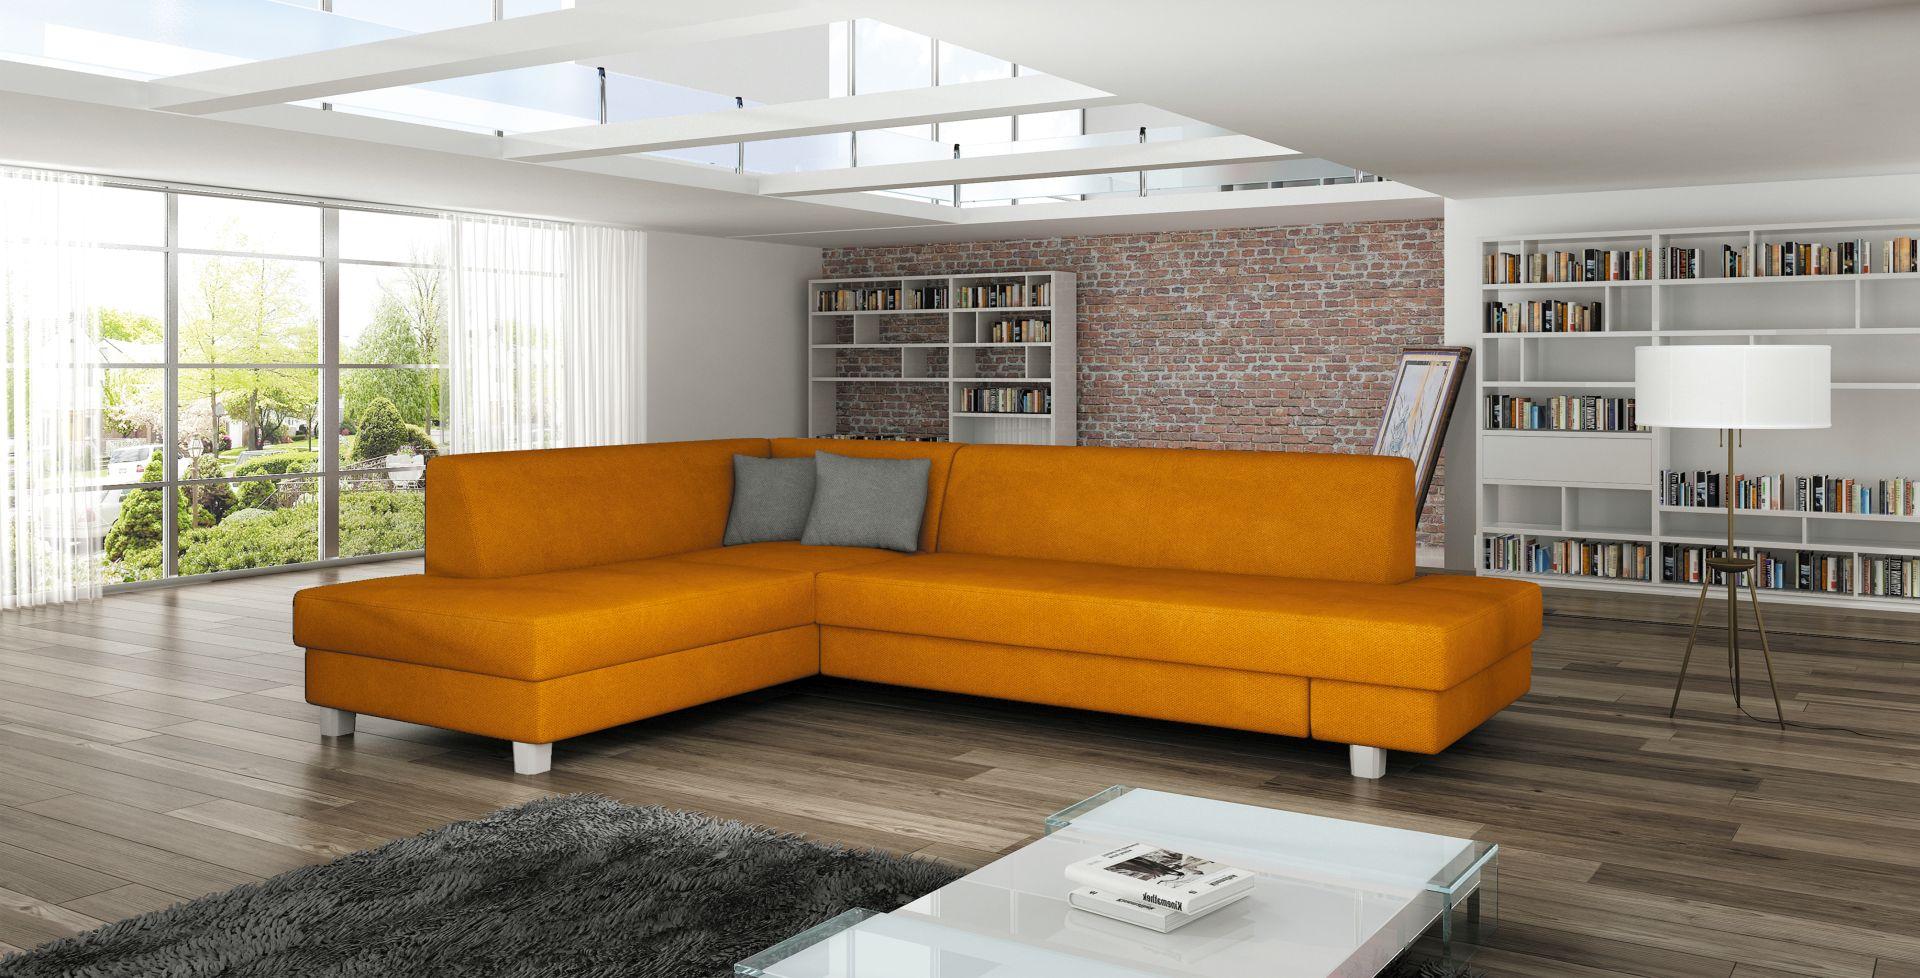 sofa schlafsofa designer sofa mit bettfunktion bettkasten ecksofa couch neu loona www. Black Bedroom Furniture Sets. Home Design Ideas